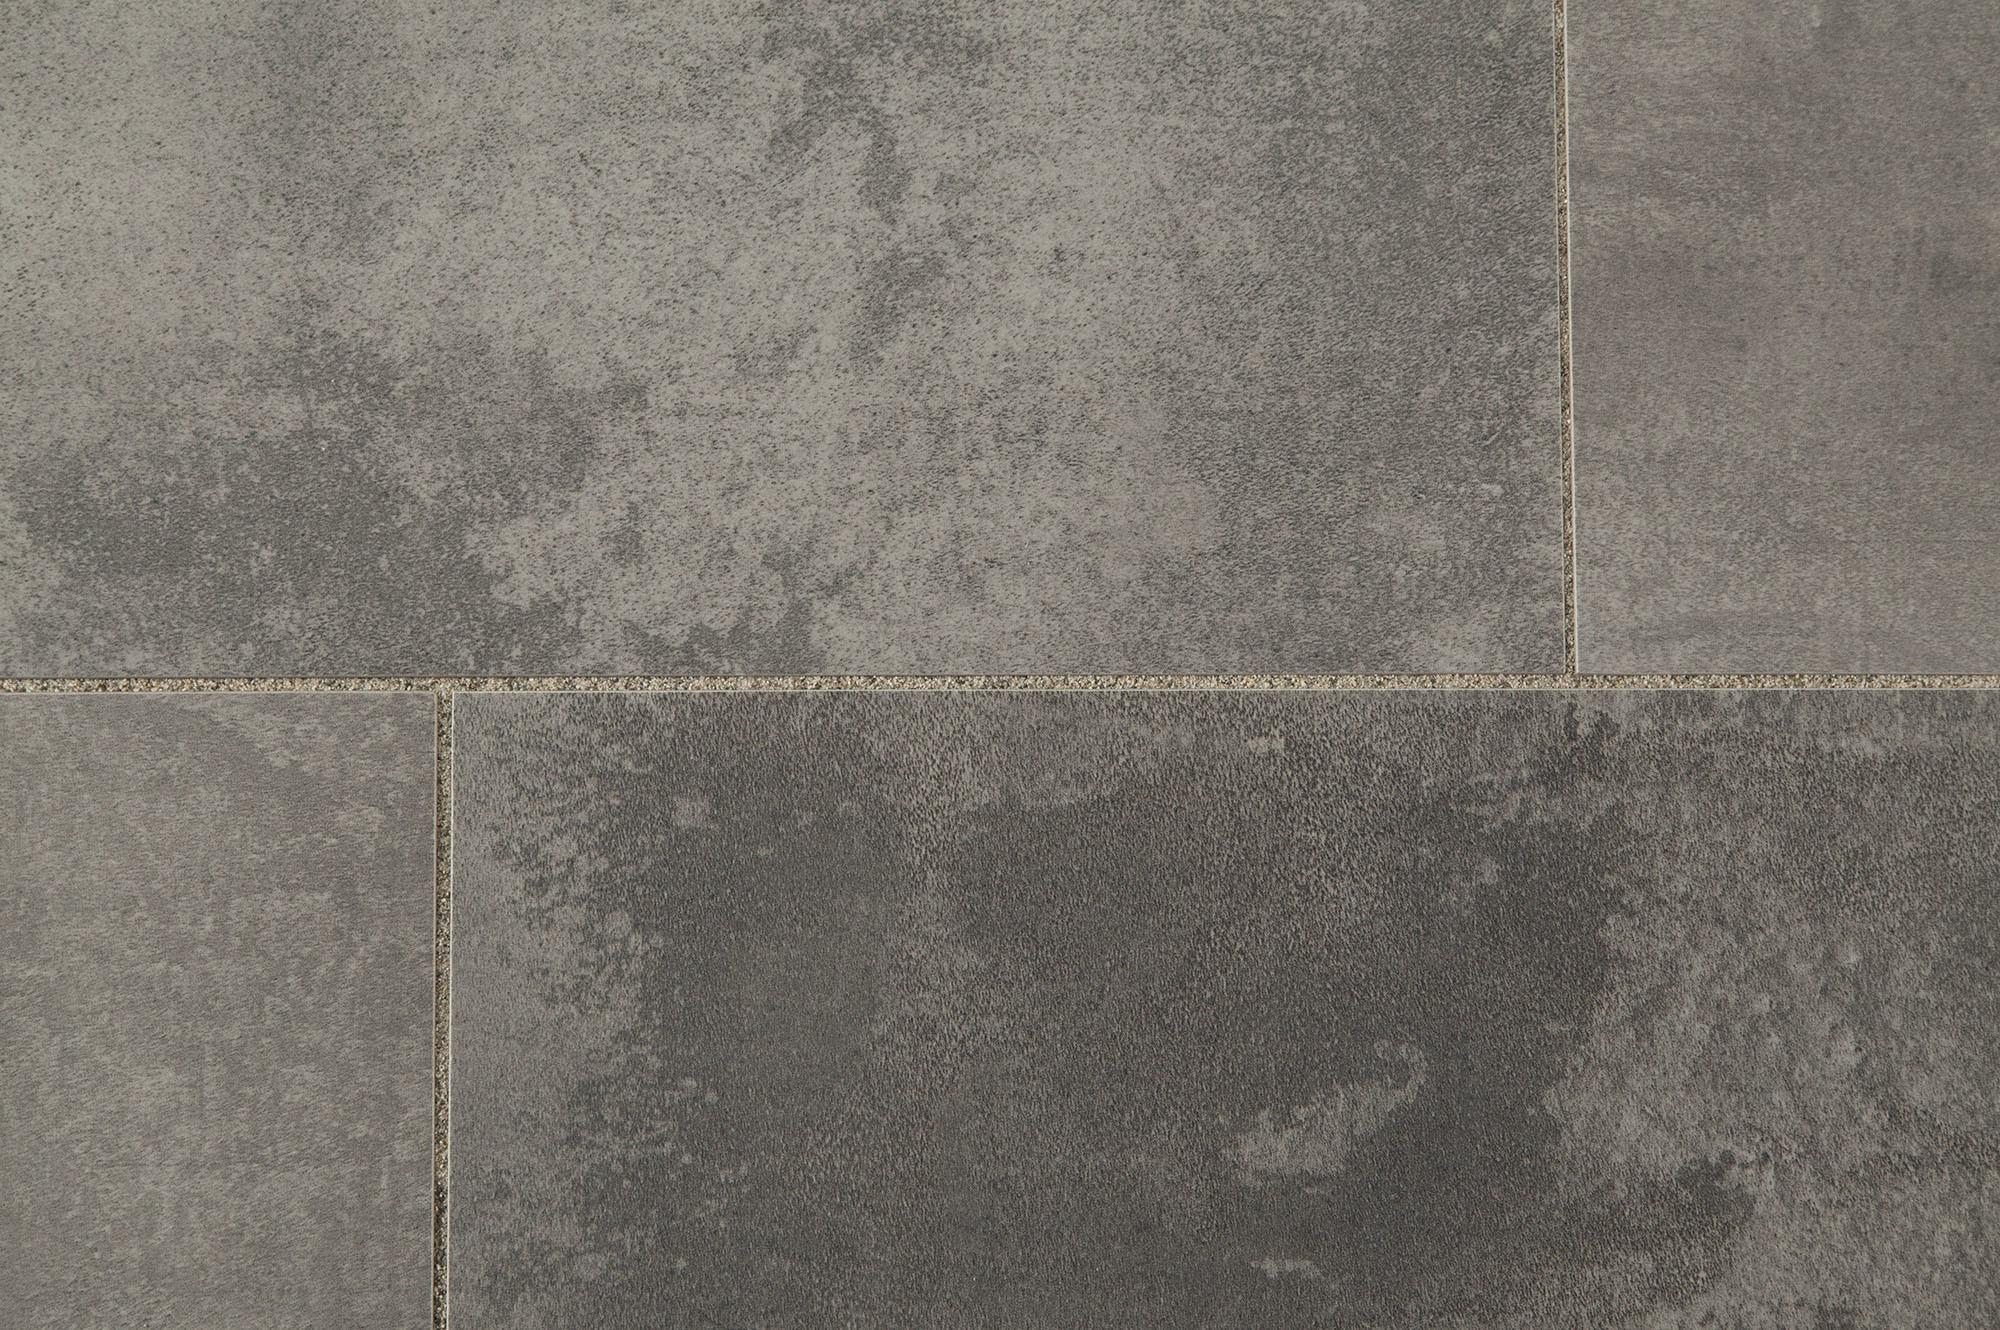 Free samples salerno porcelain tile concrete series dark gray free samples salerno porcelain tile concrete series dark gray 12x24 dailygadgetfo Image collections